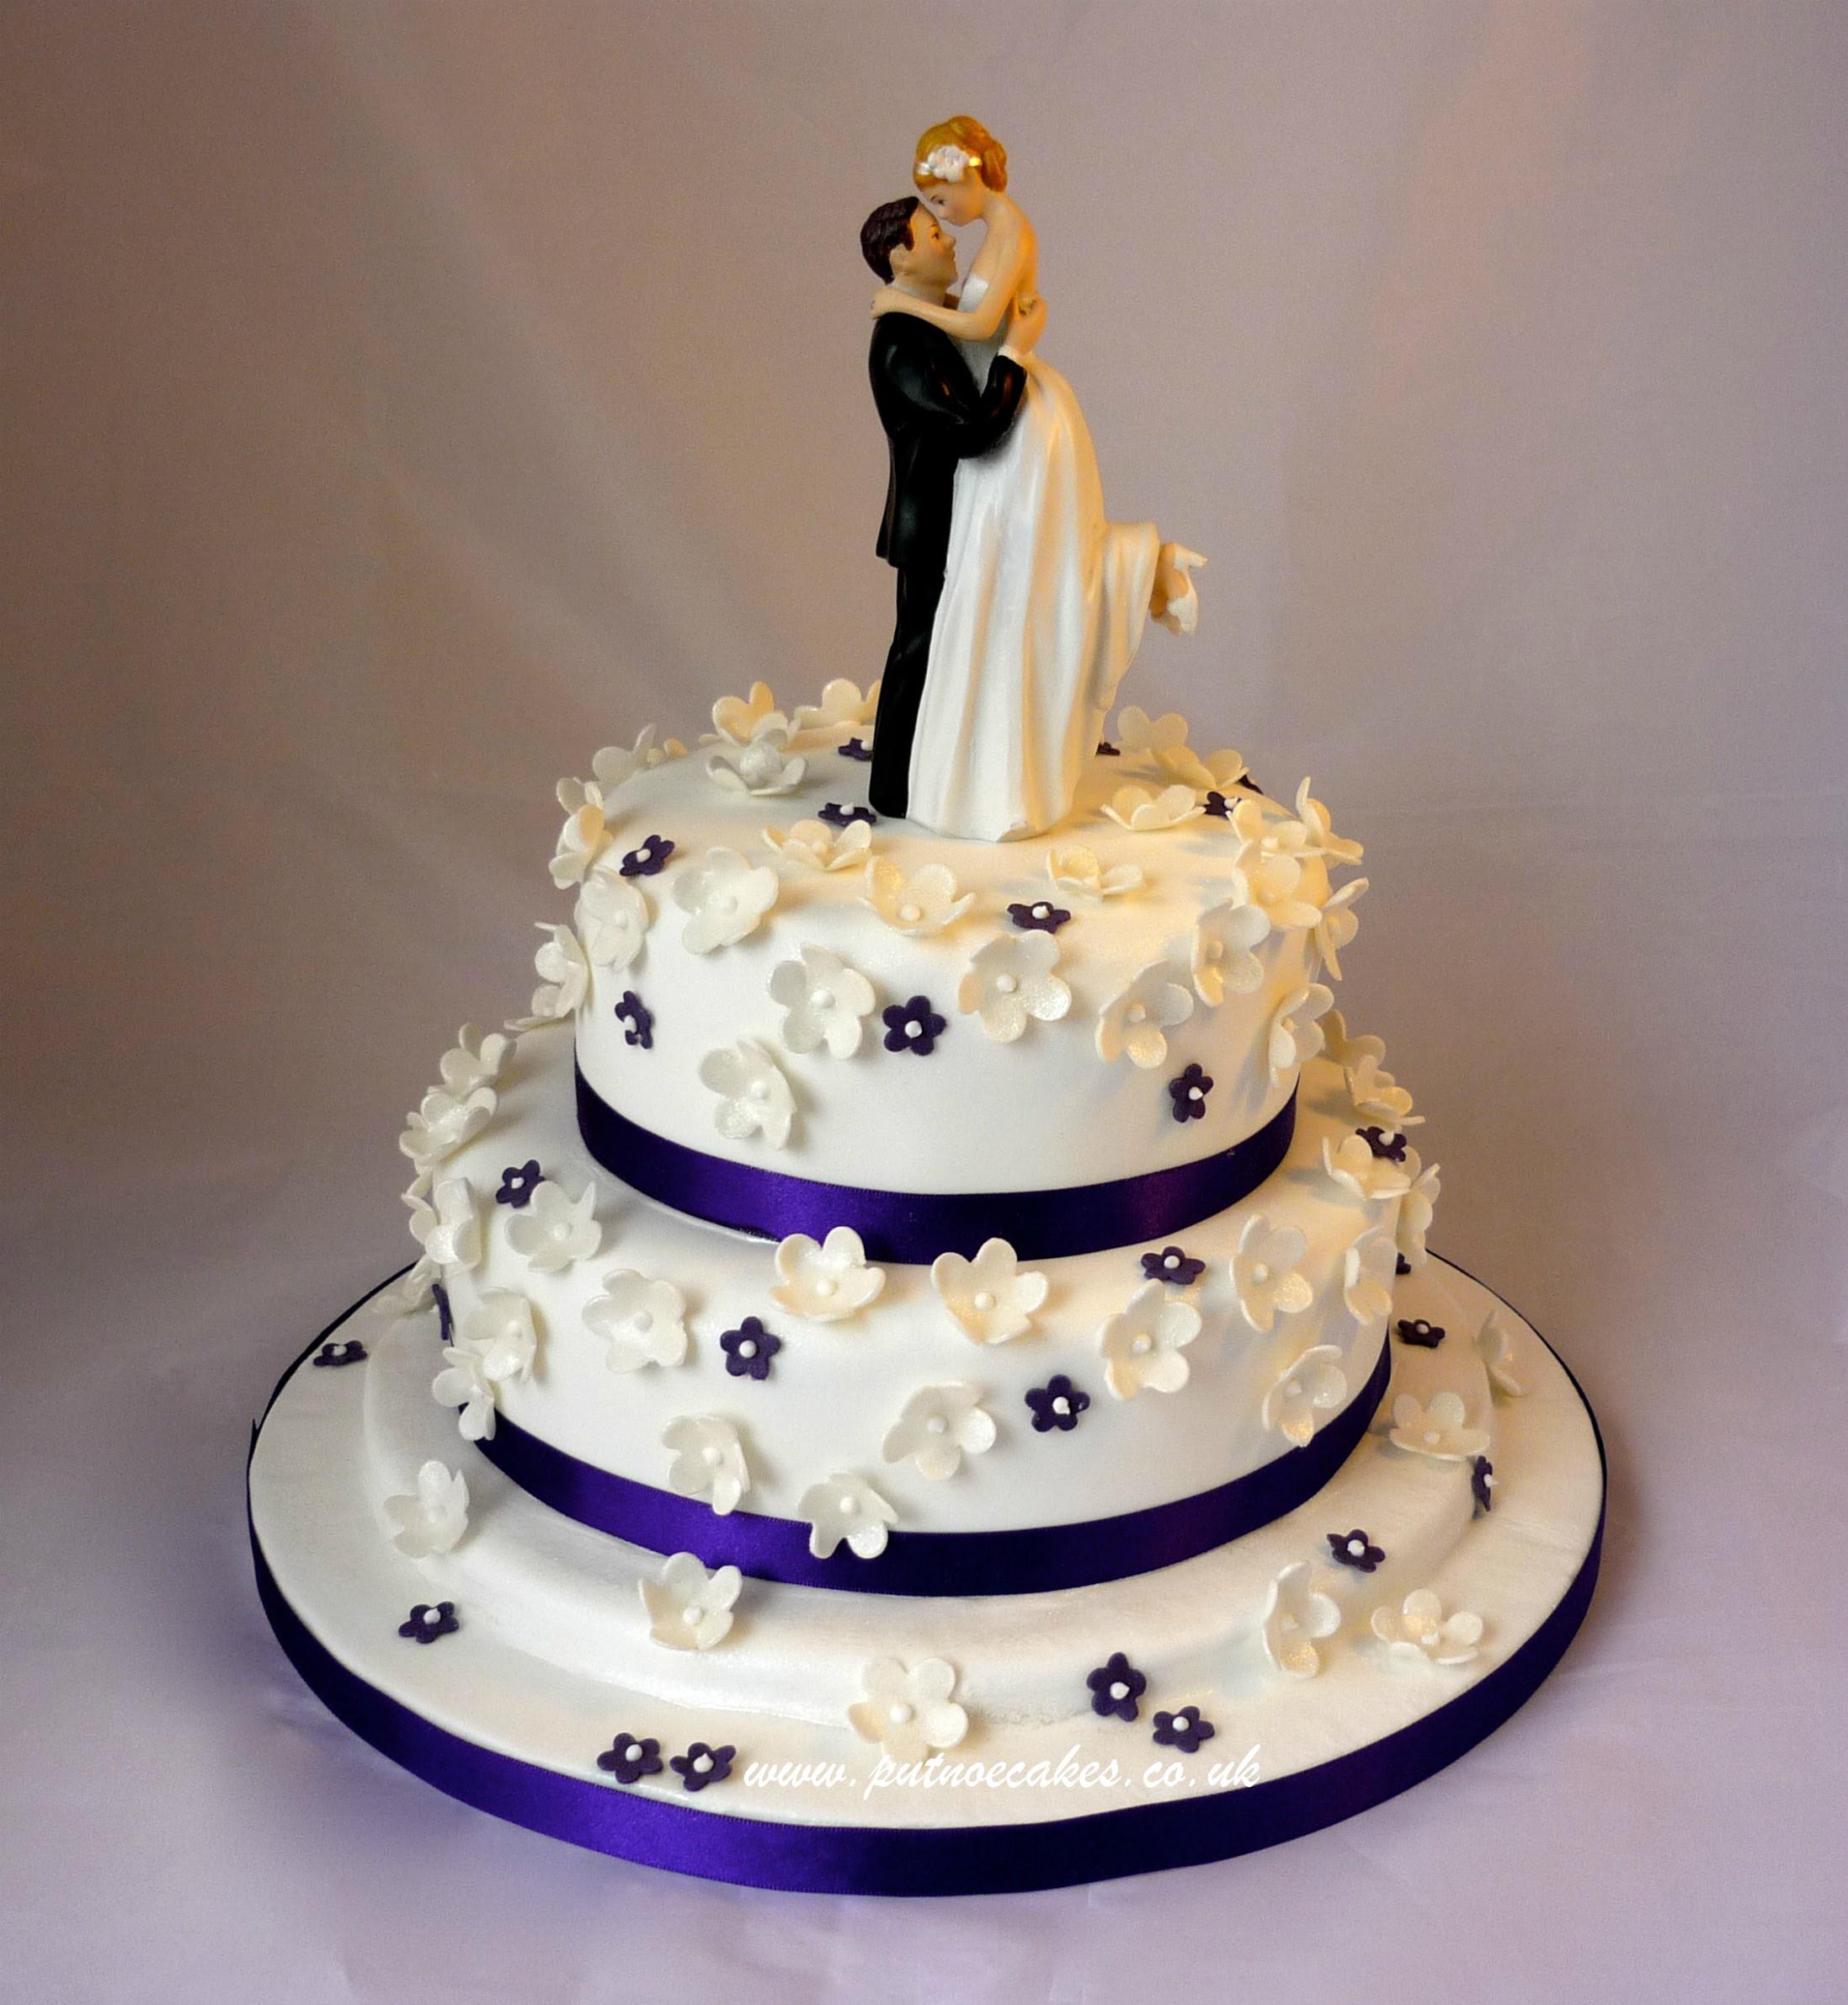 Hottest Wedding Cake Trends For 2014 Cardinal Bridal